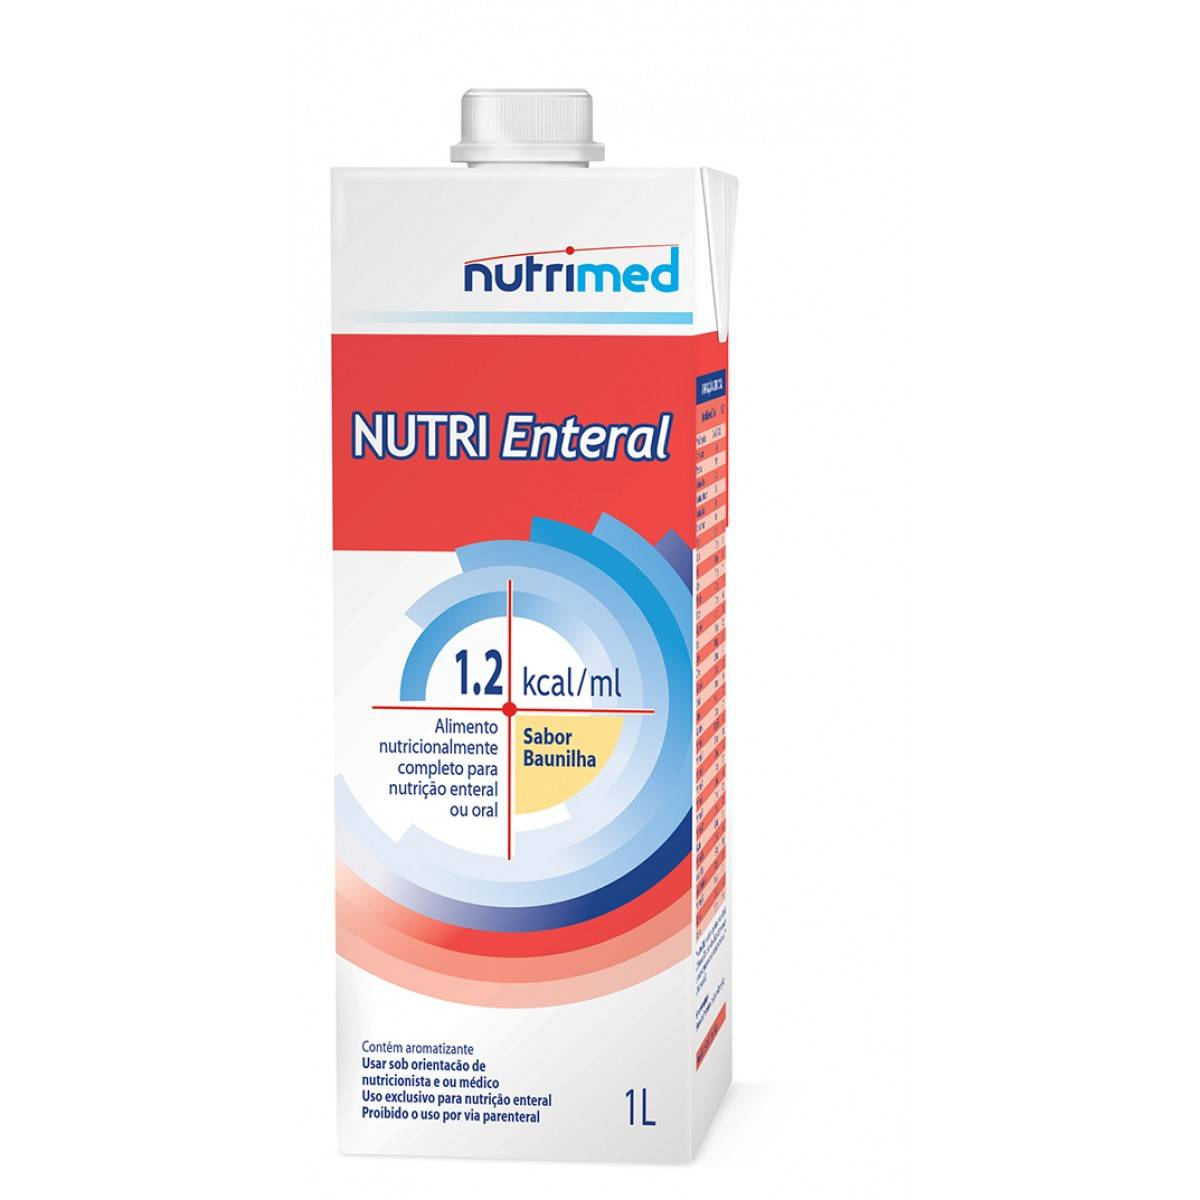 Nutri Enteral  (1.2 Kcal/ml) Tetra Pak - 1 L - (DANONE)